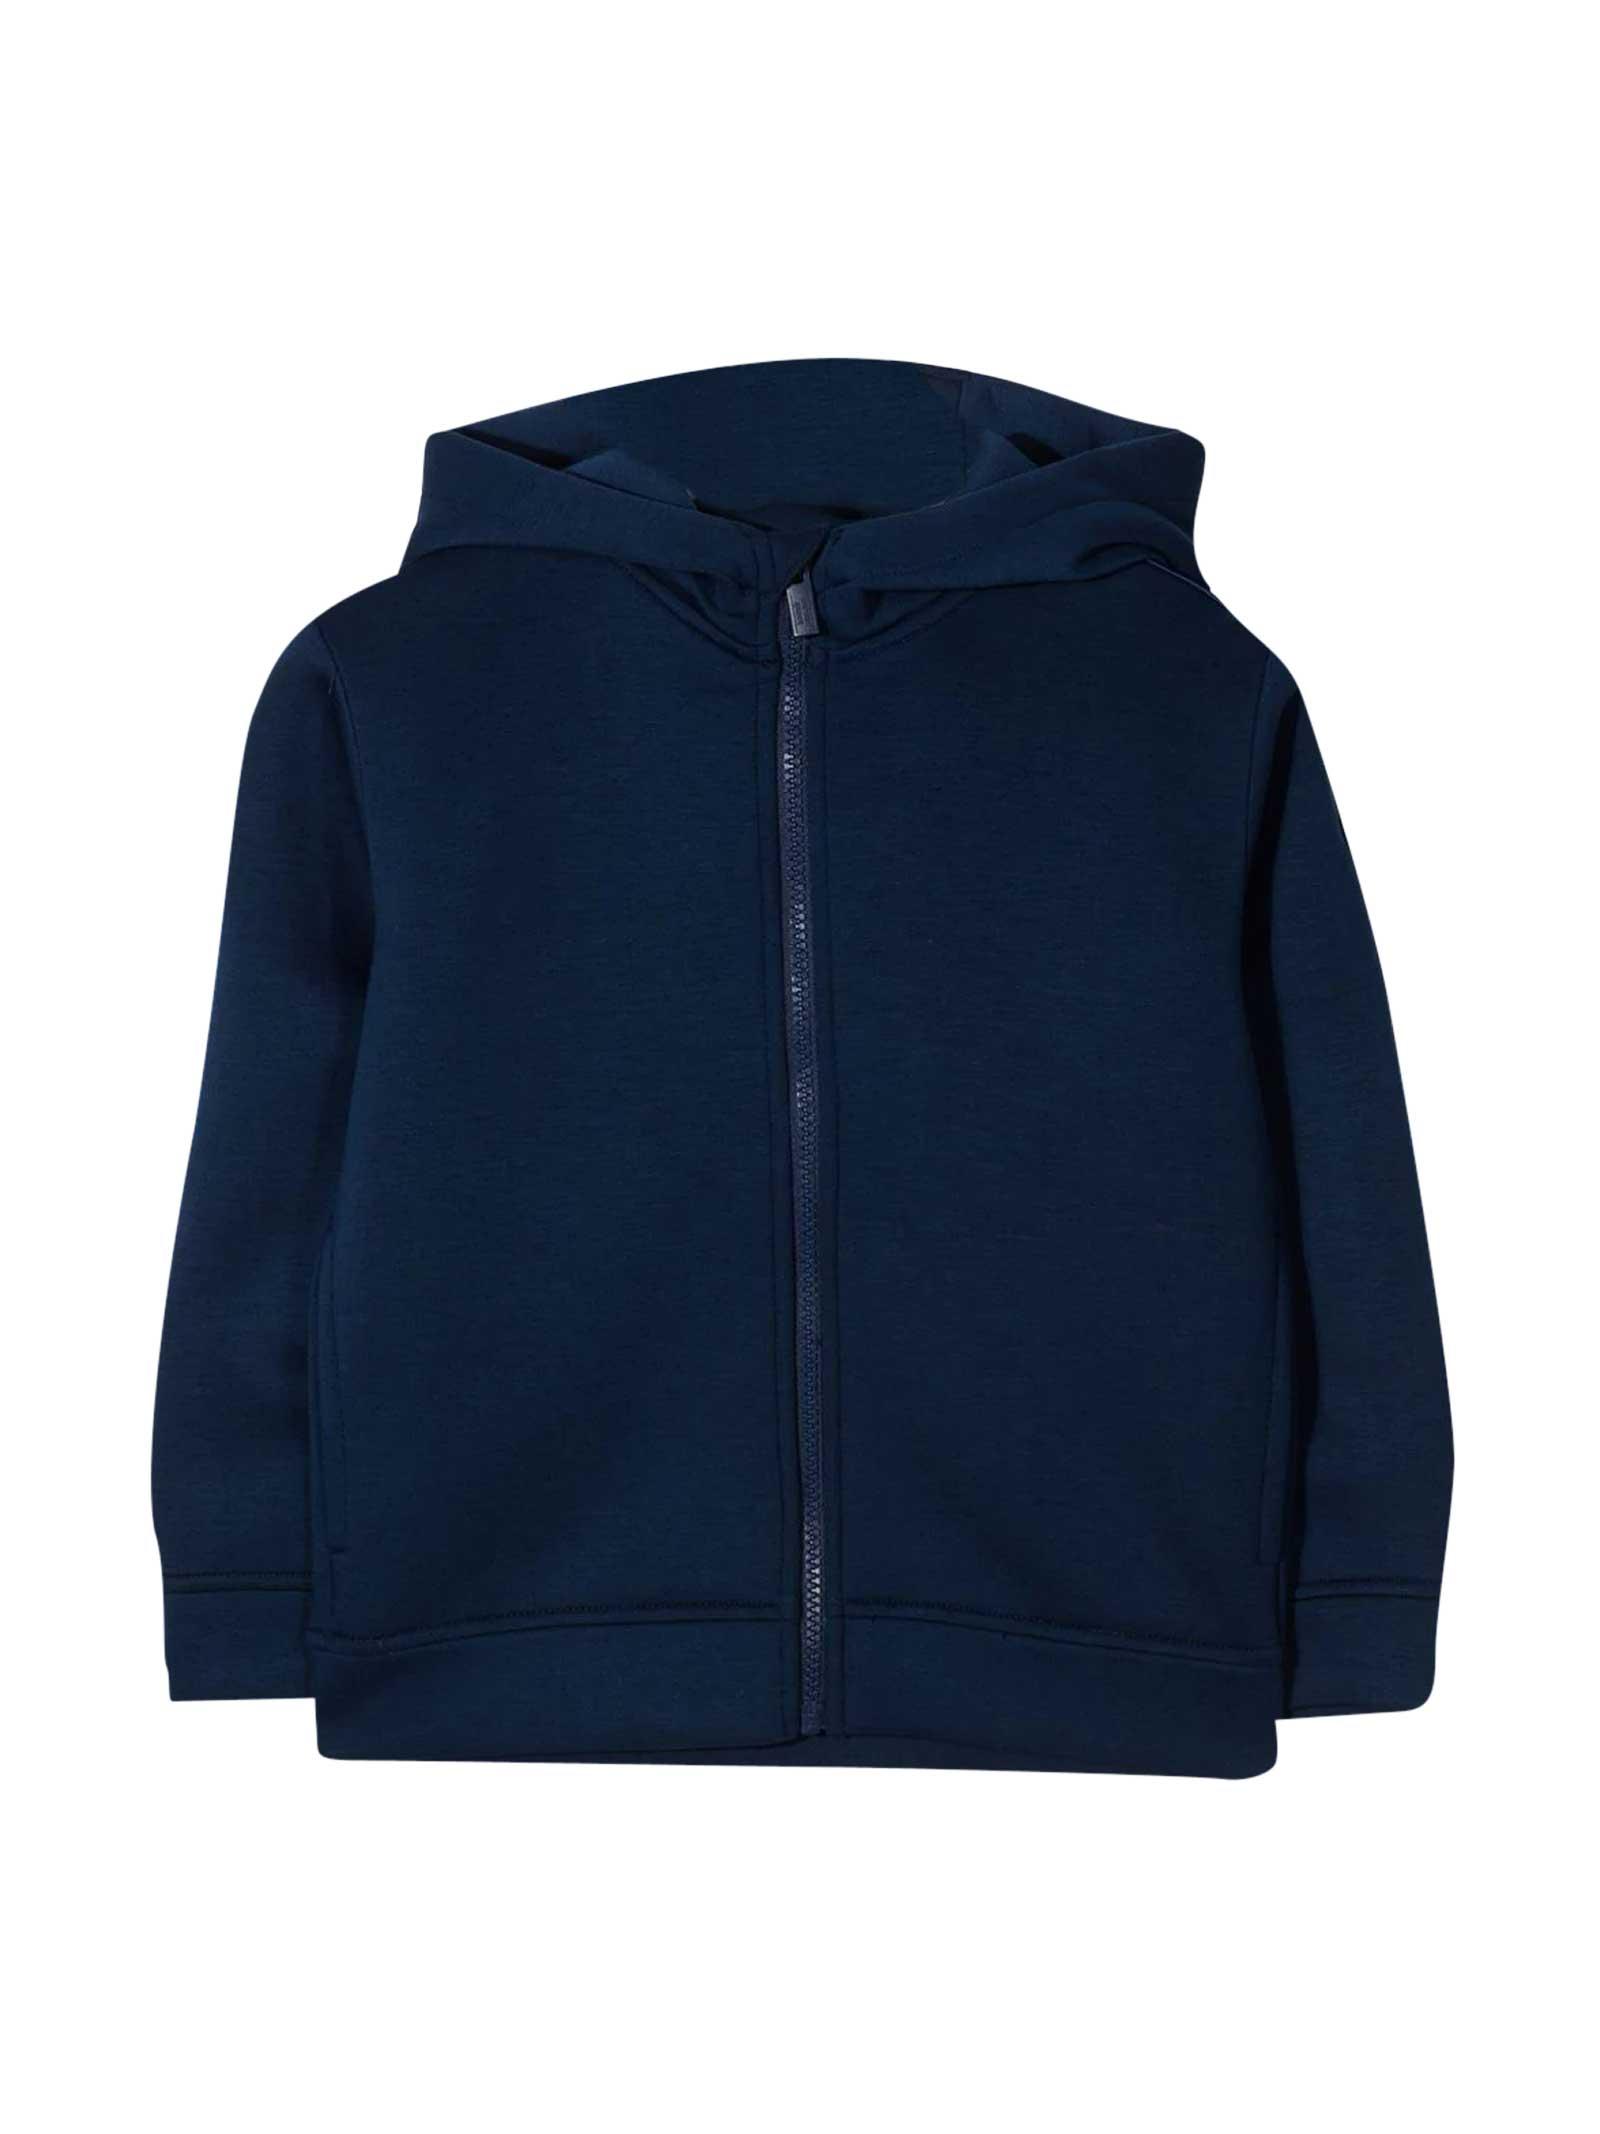 Emporio Armani Blue Sweatshirt